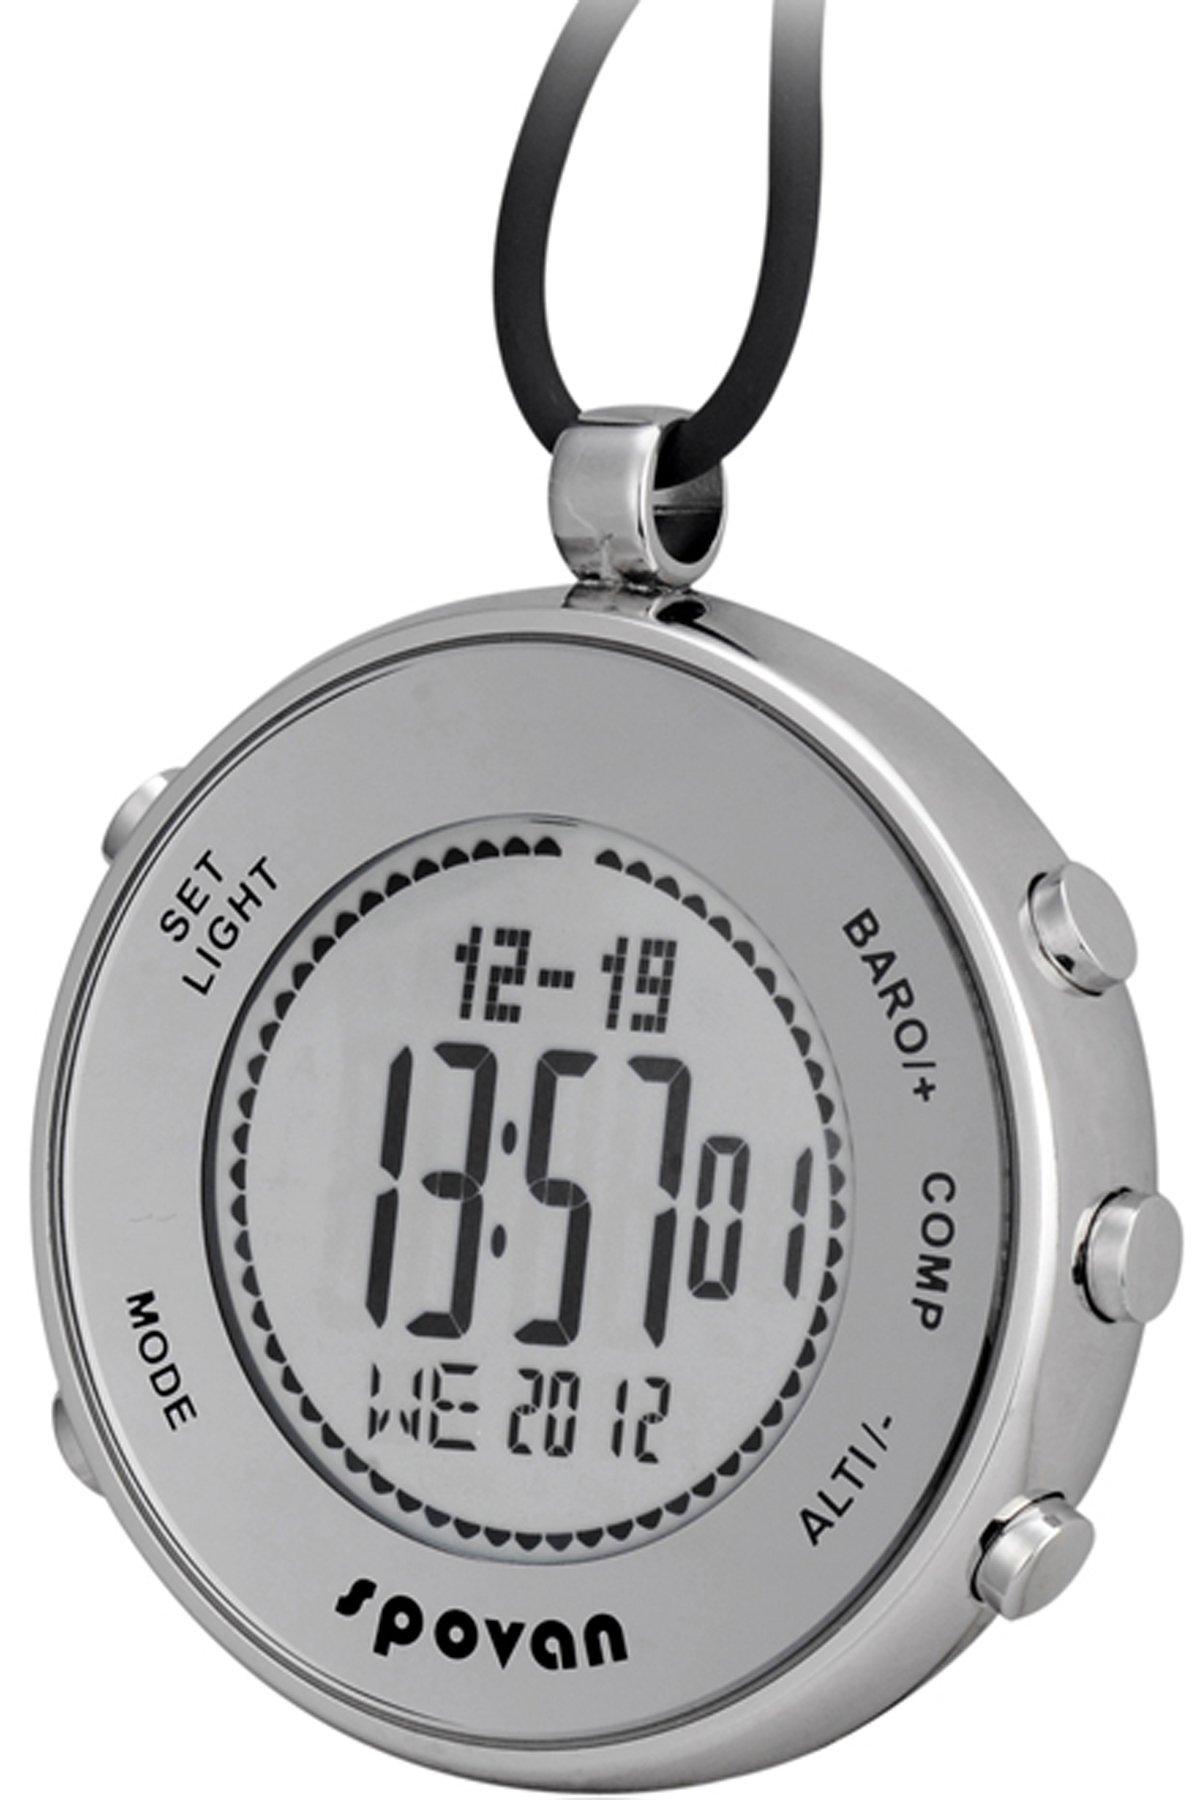 | Spovan Silver Digital Pocket Watches Hiking Altimeter Barometer Compass